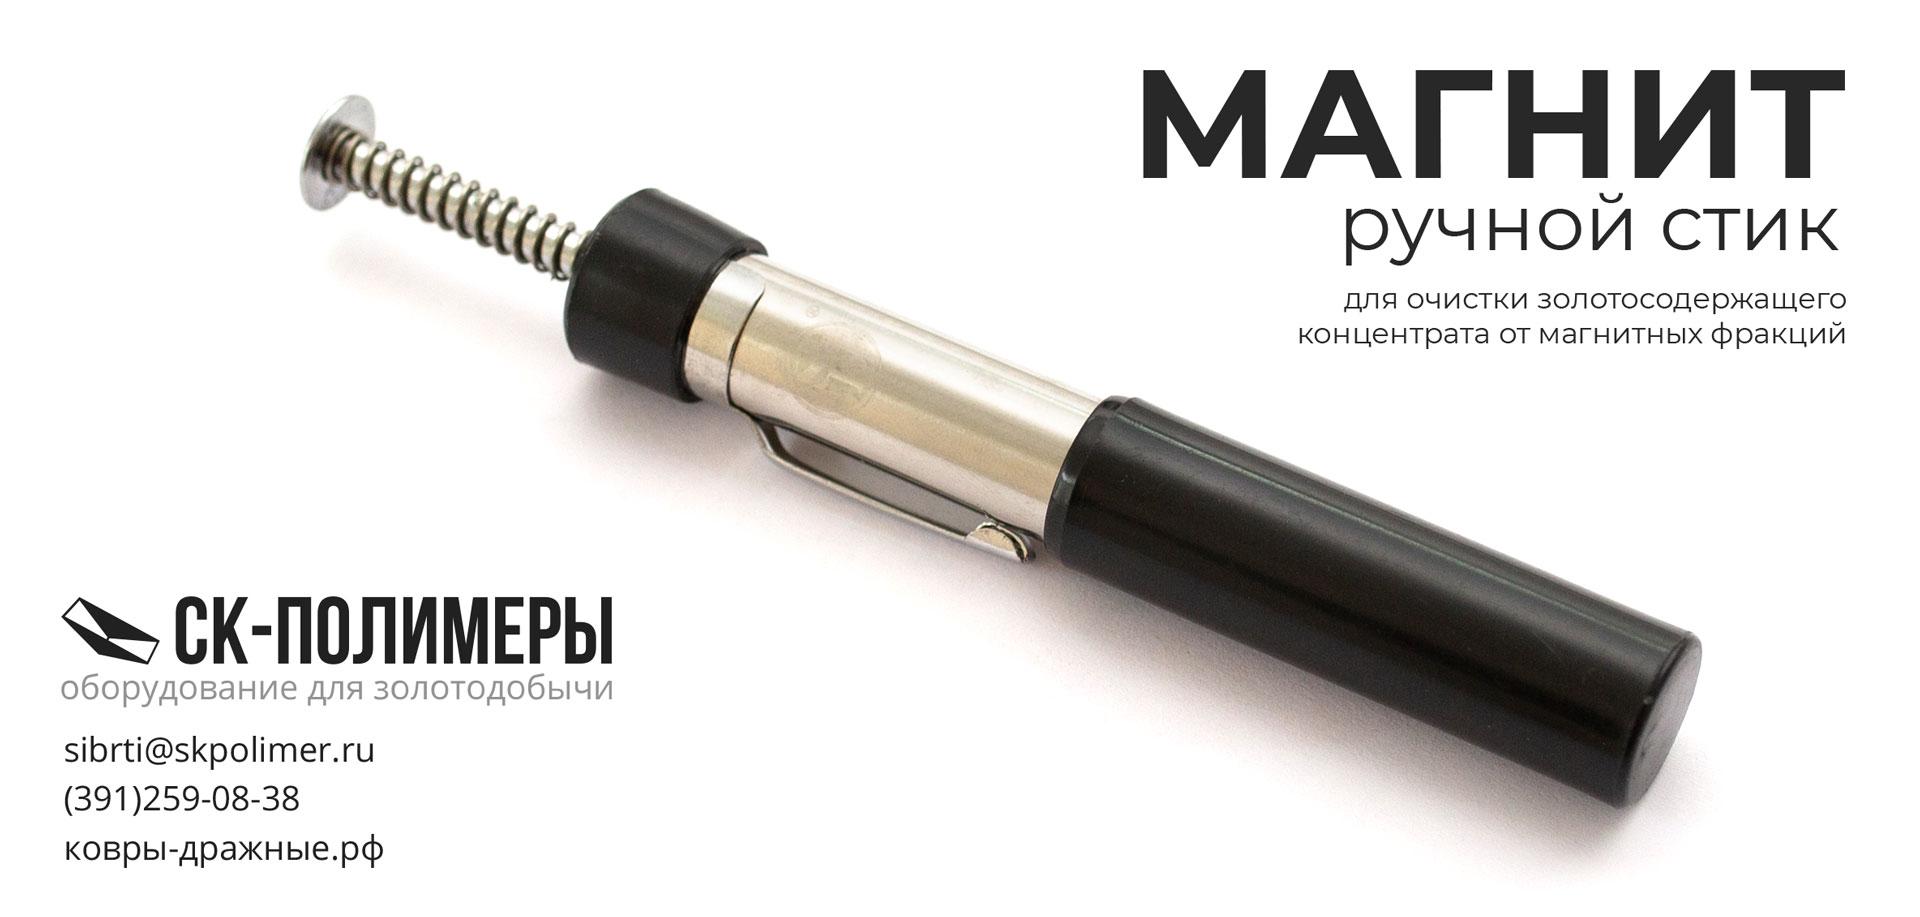 Separator pen